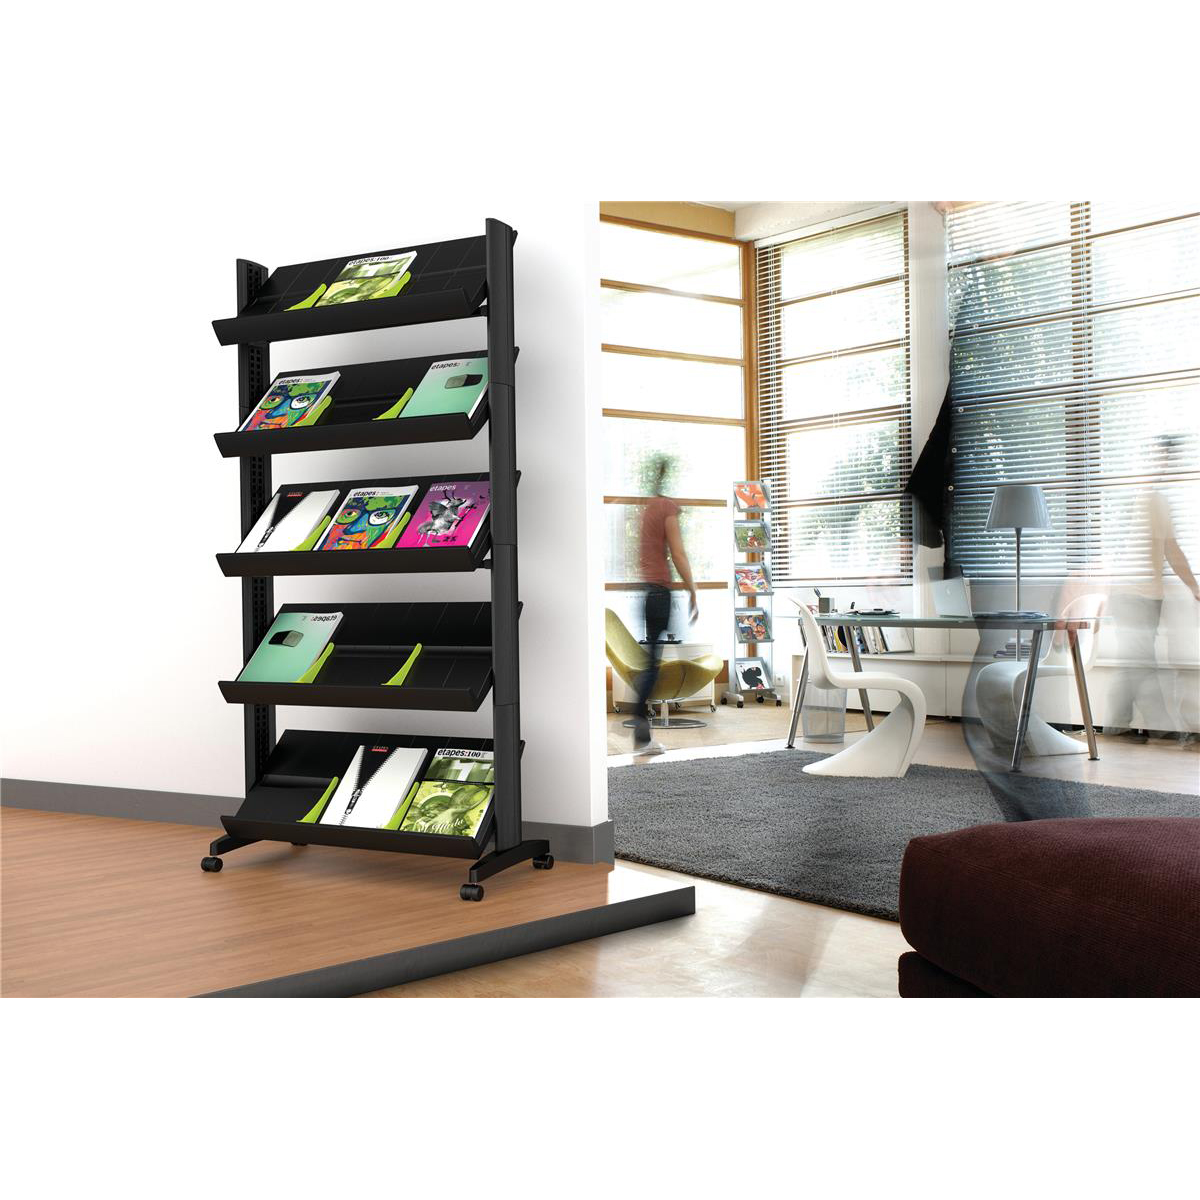 Fast Paper Literature Display Mobile Single Sided 5 Shelves 35mm Lip Black Ref 255N.01